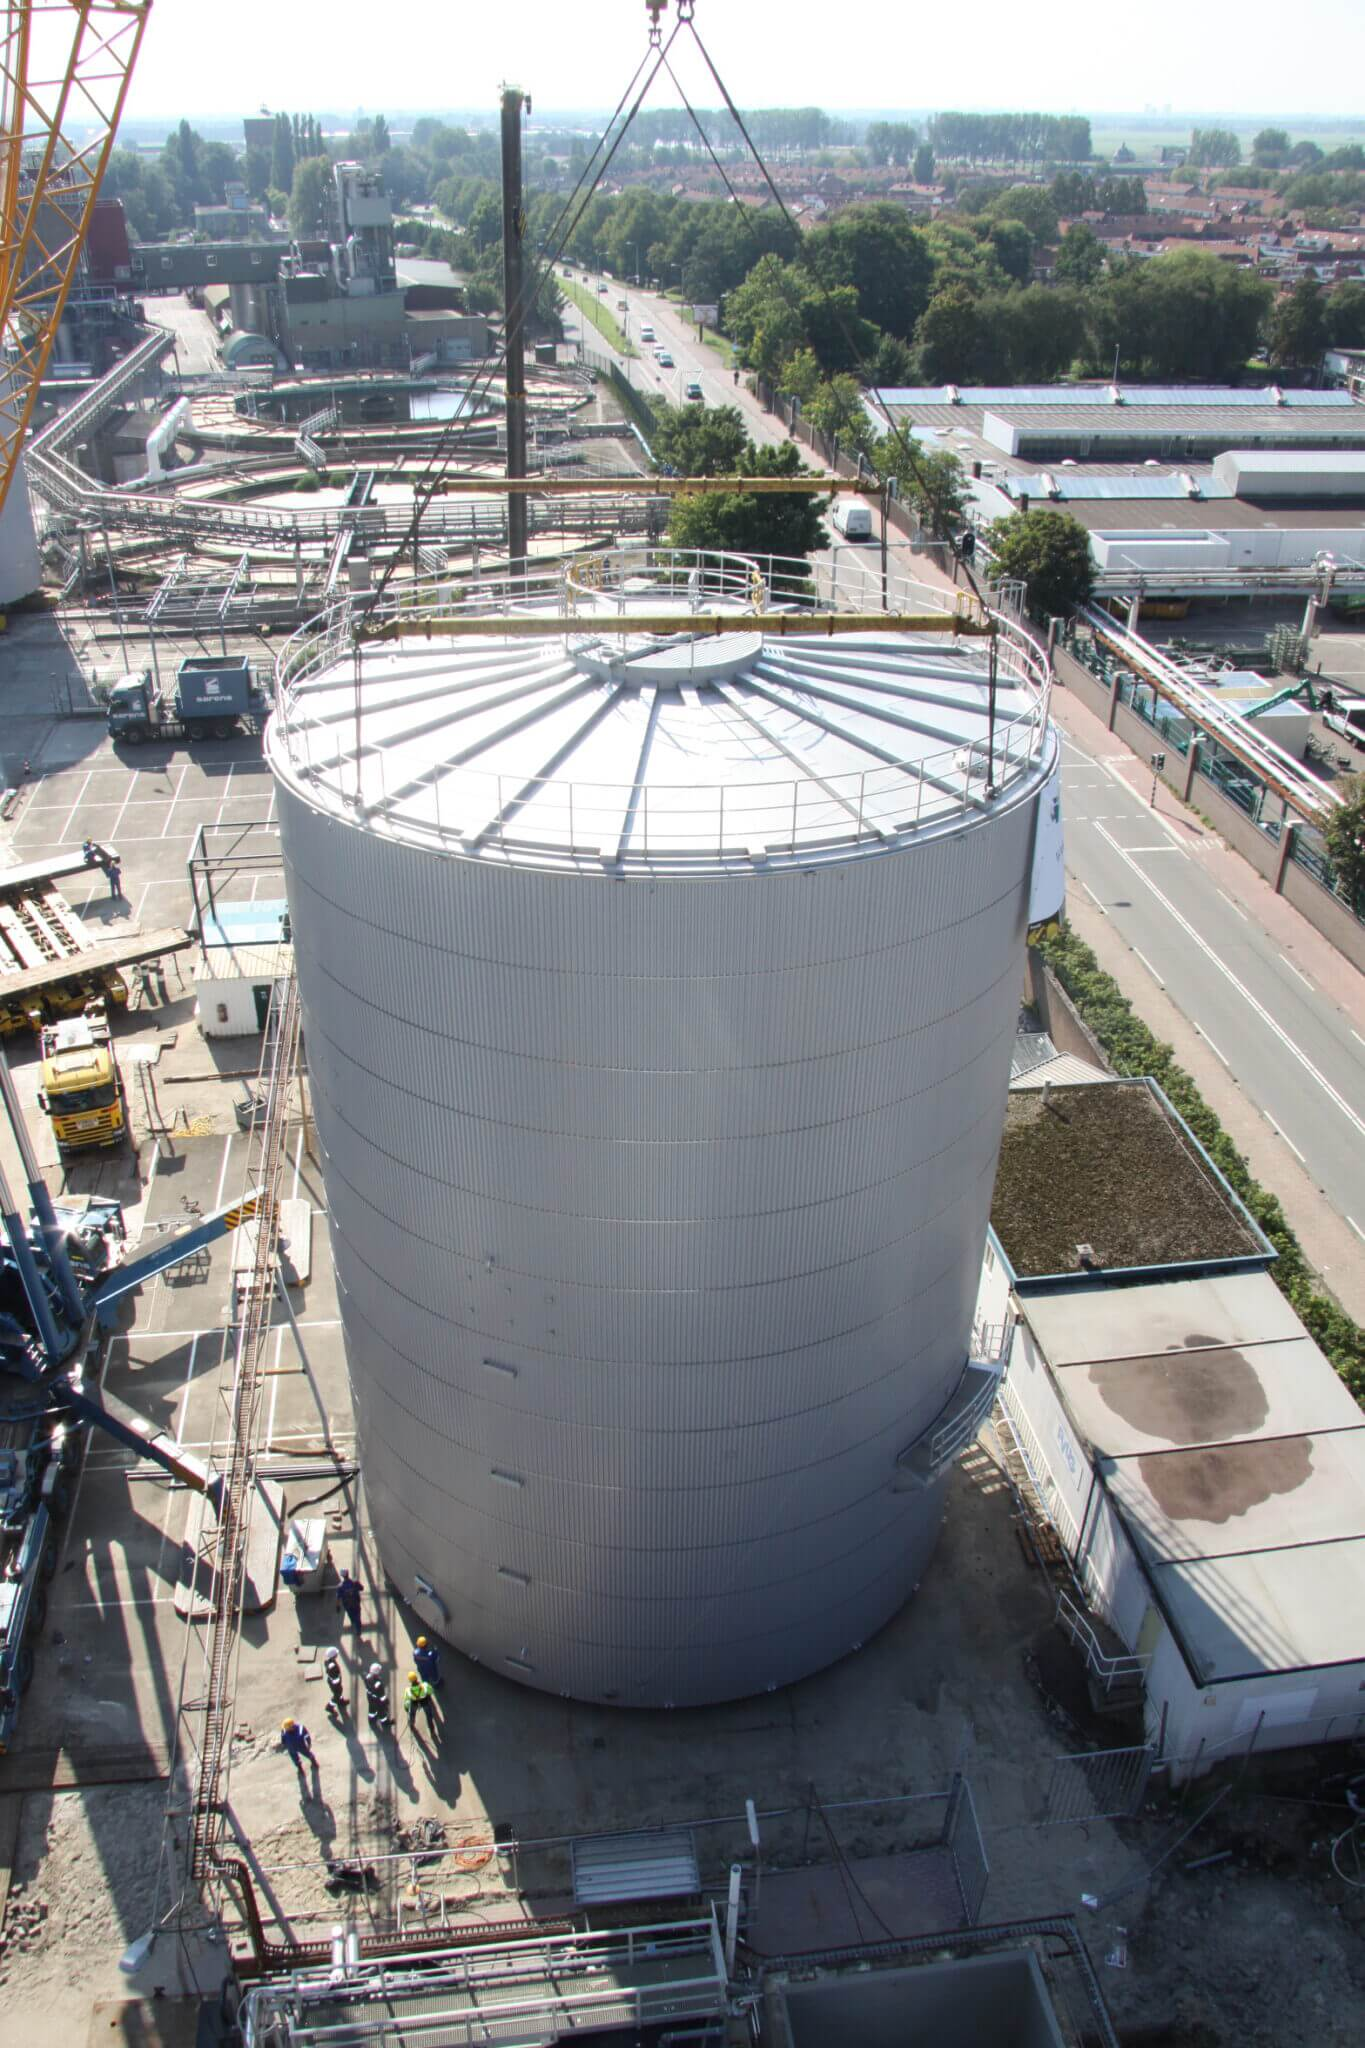 Bouwmethode: multiple tanks on site